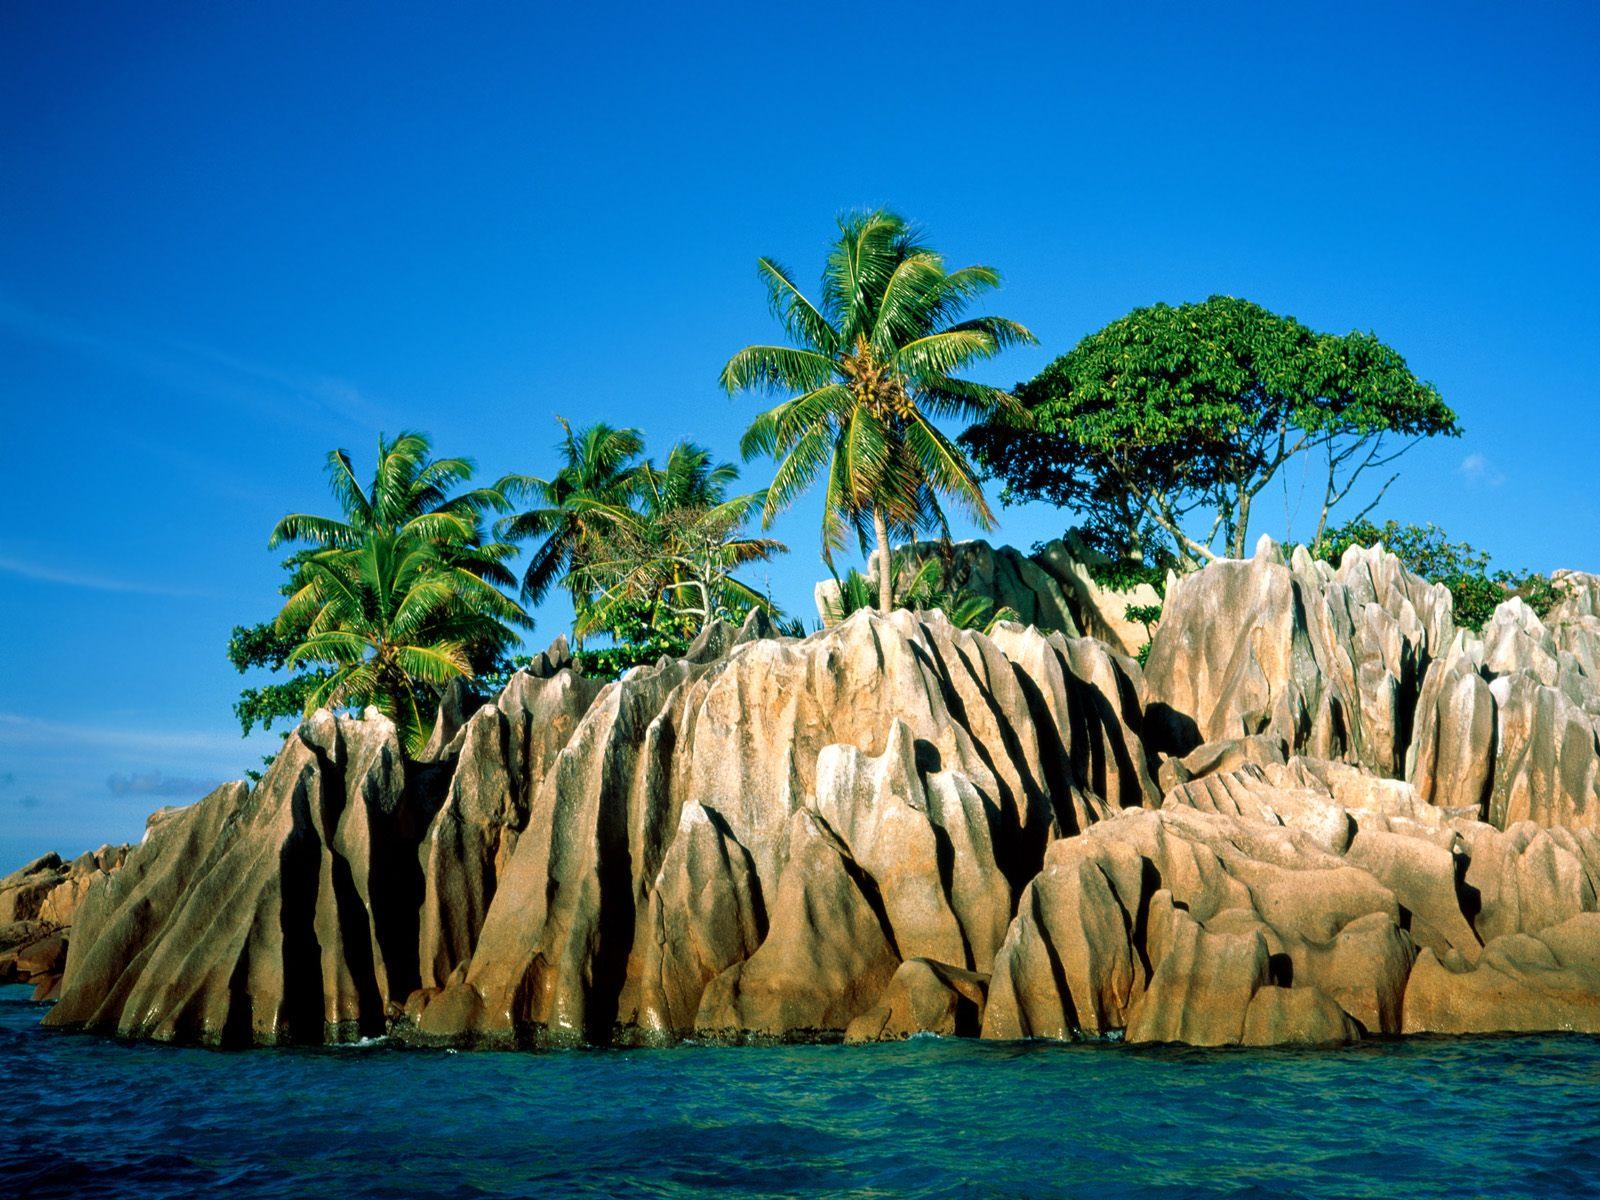 download caribbean beach wallpaper which is under the beach 1600x1200